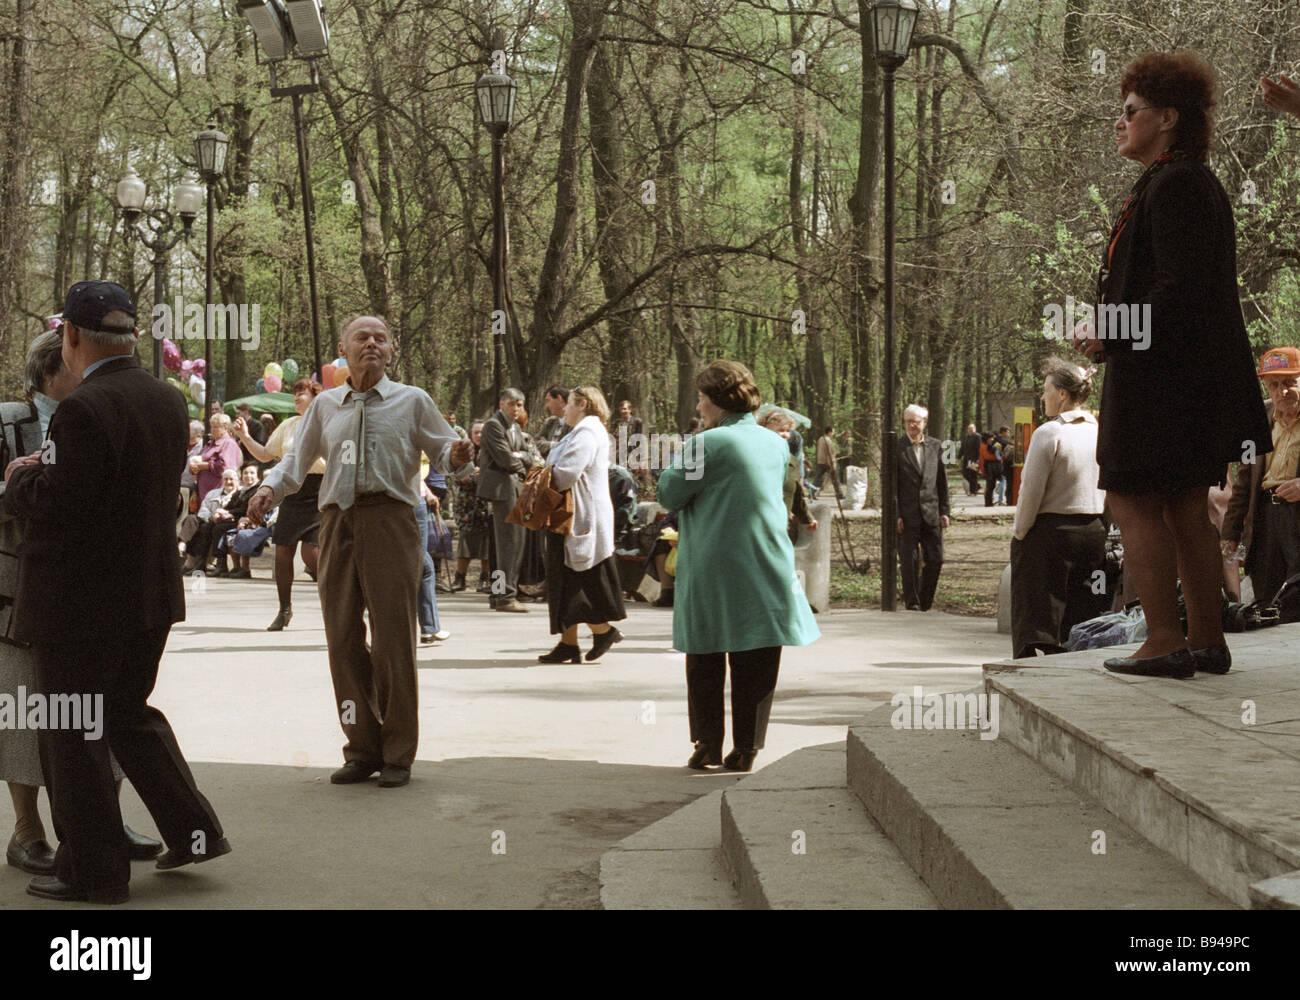 Moscow residents in Sokolniki park - Stock Image